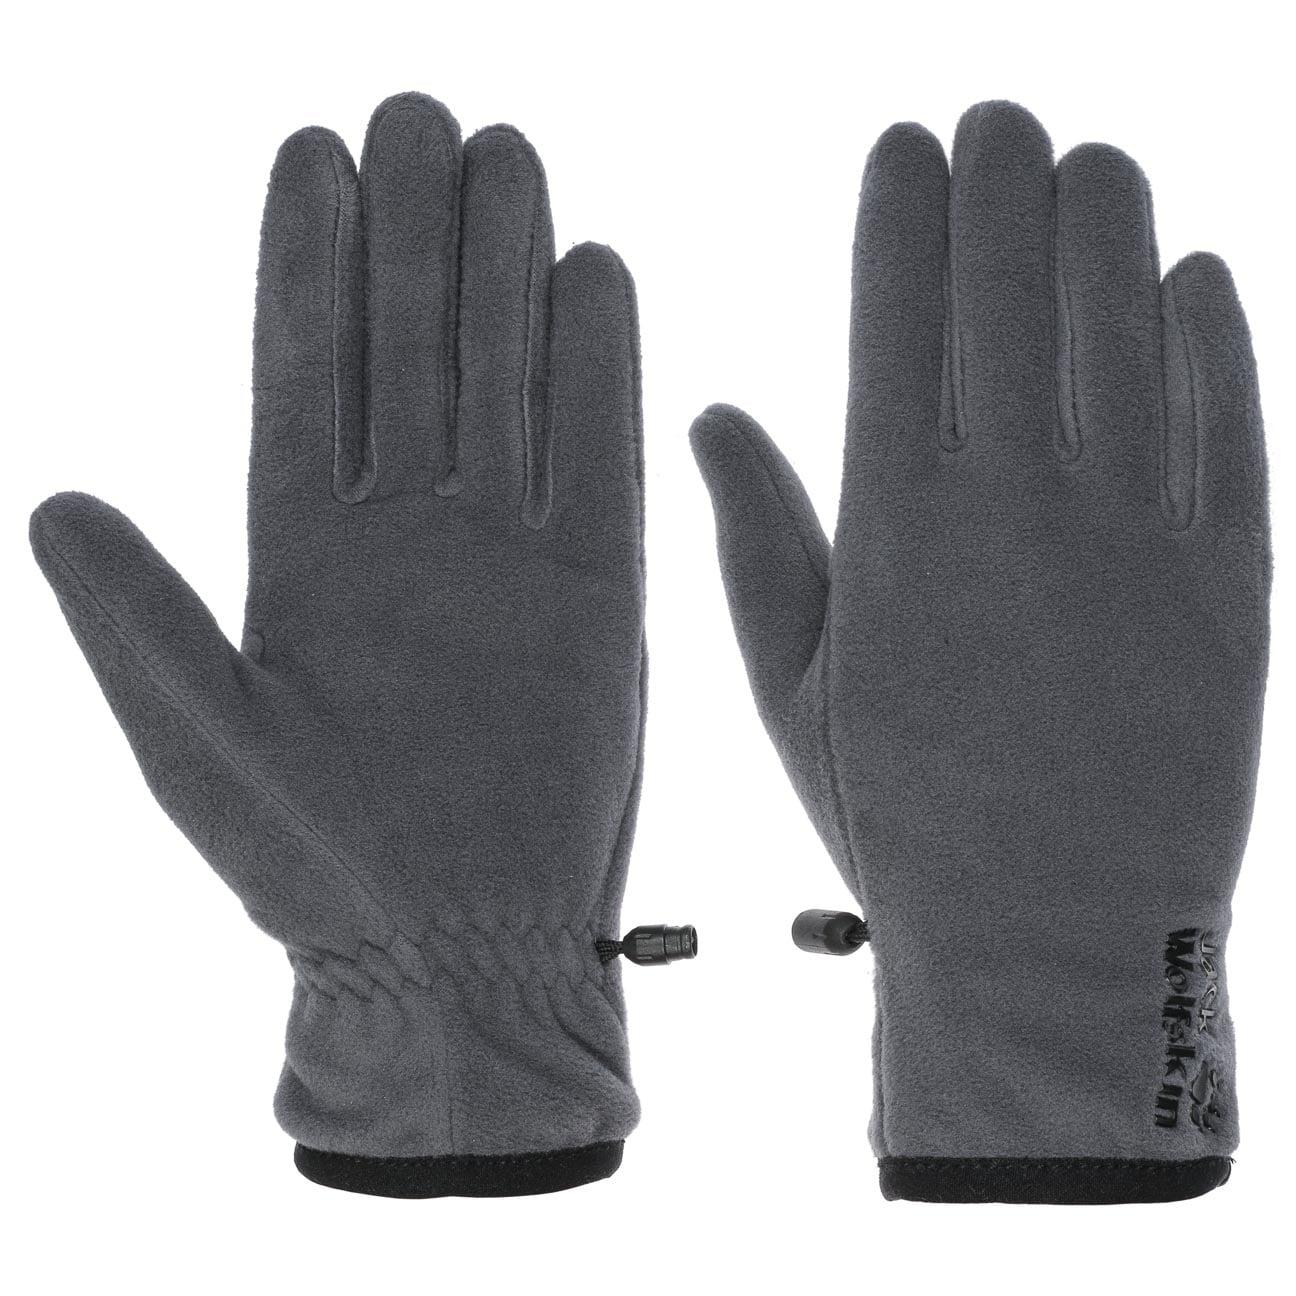 Nanuk Ecosphere Handschuhe by Jack Wolfskin  Herrenhandschuhe